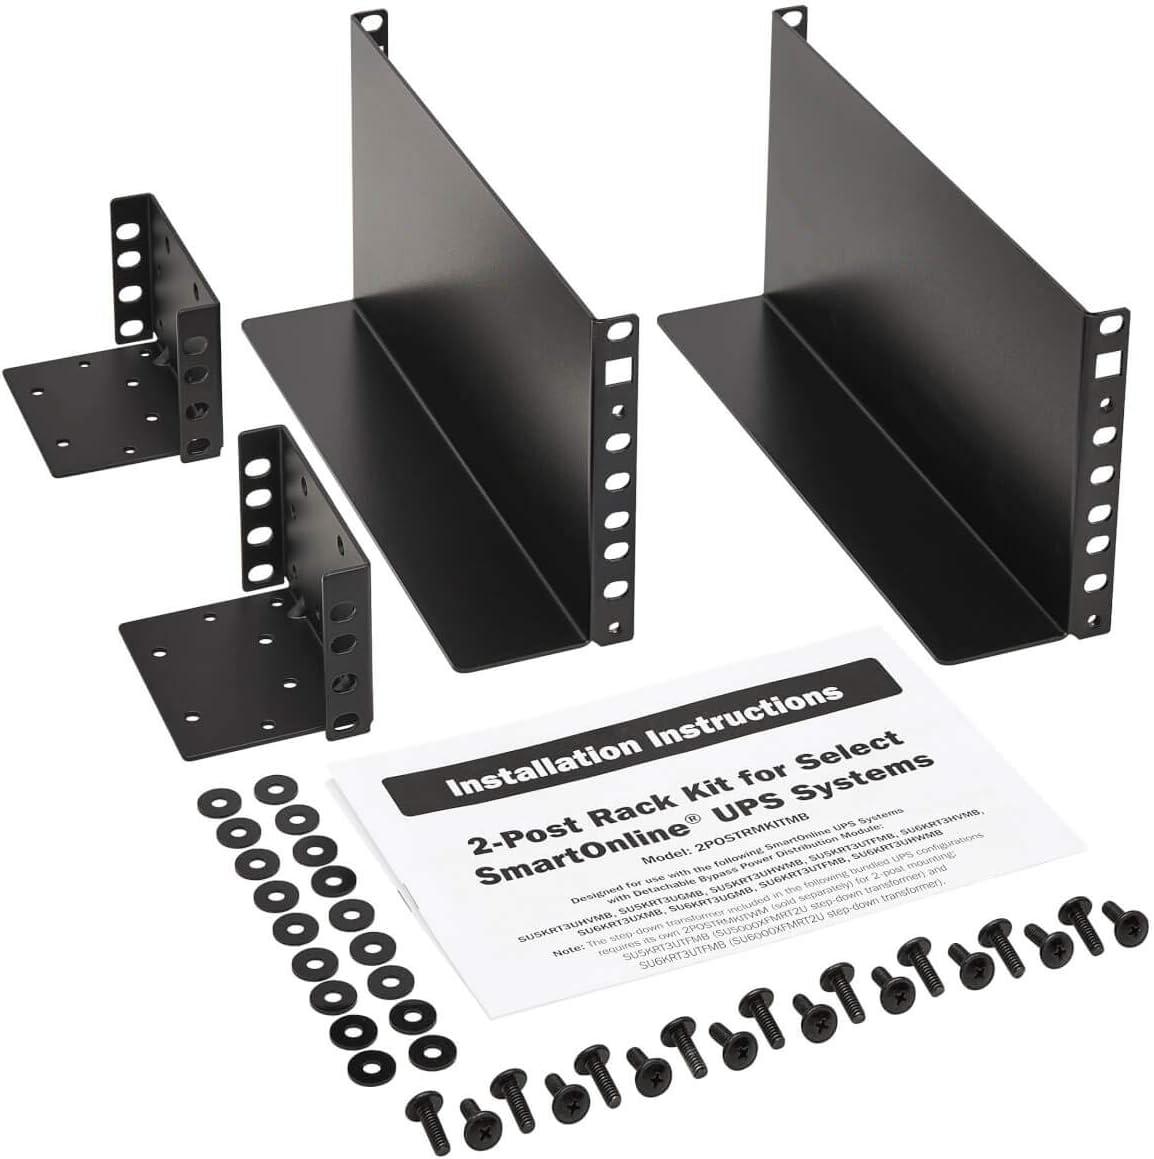 Tripp Lite 2-Post Rackmount Installation Kit for Unity Power UPS (2POSTRMKITMB)